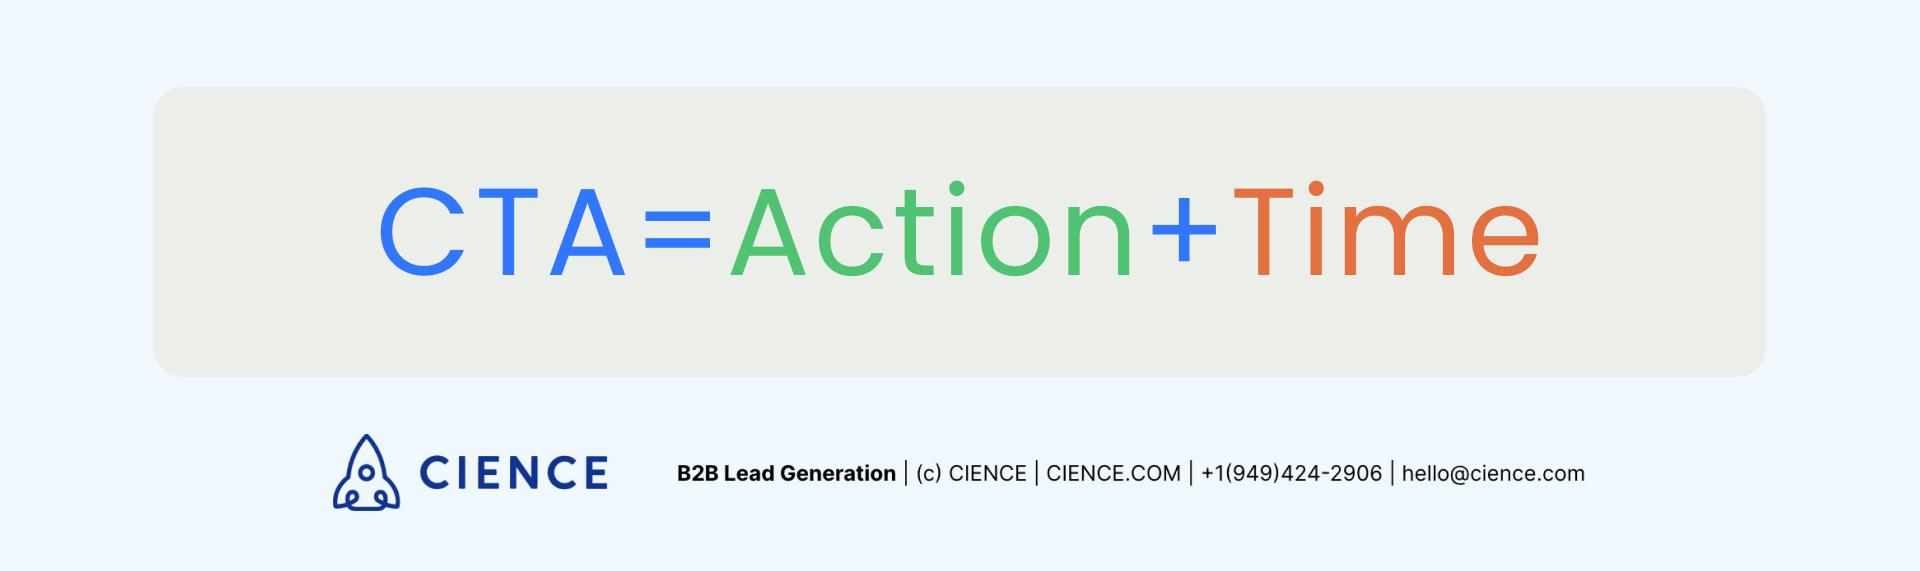 Call to action formula CTA